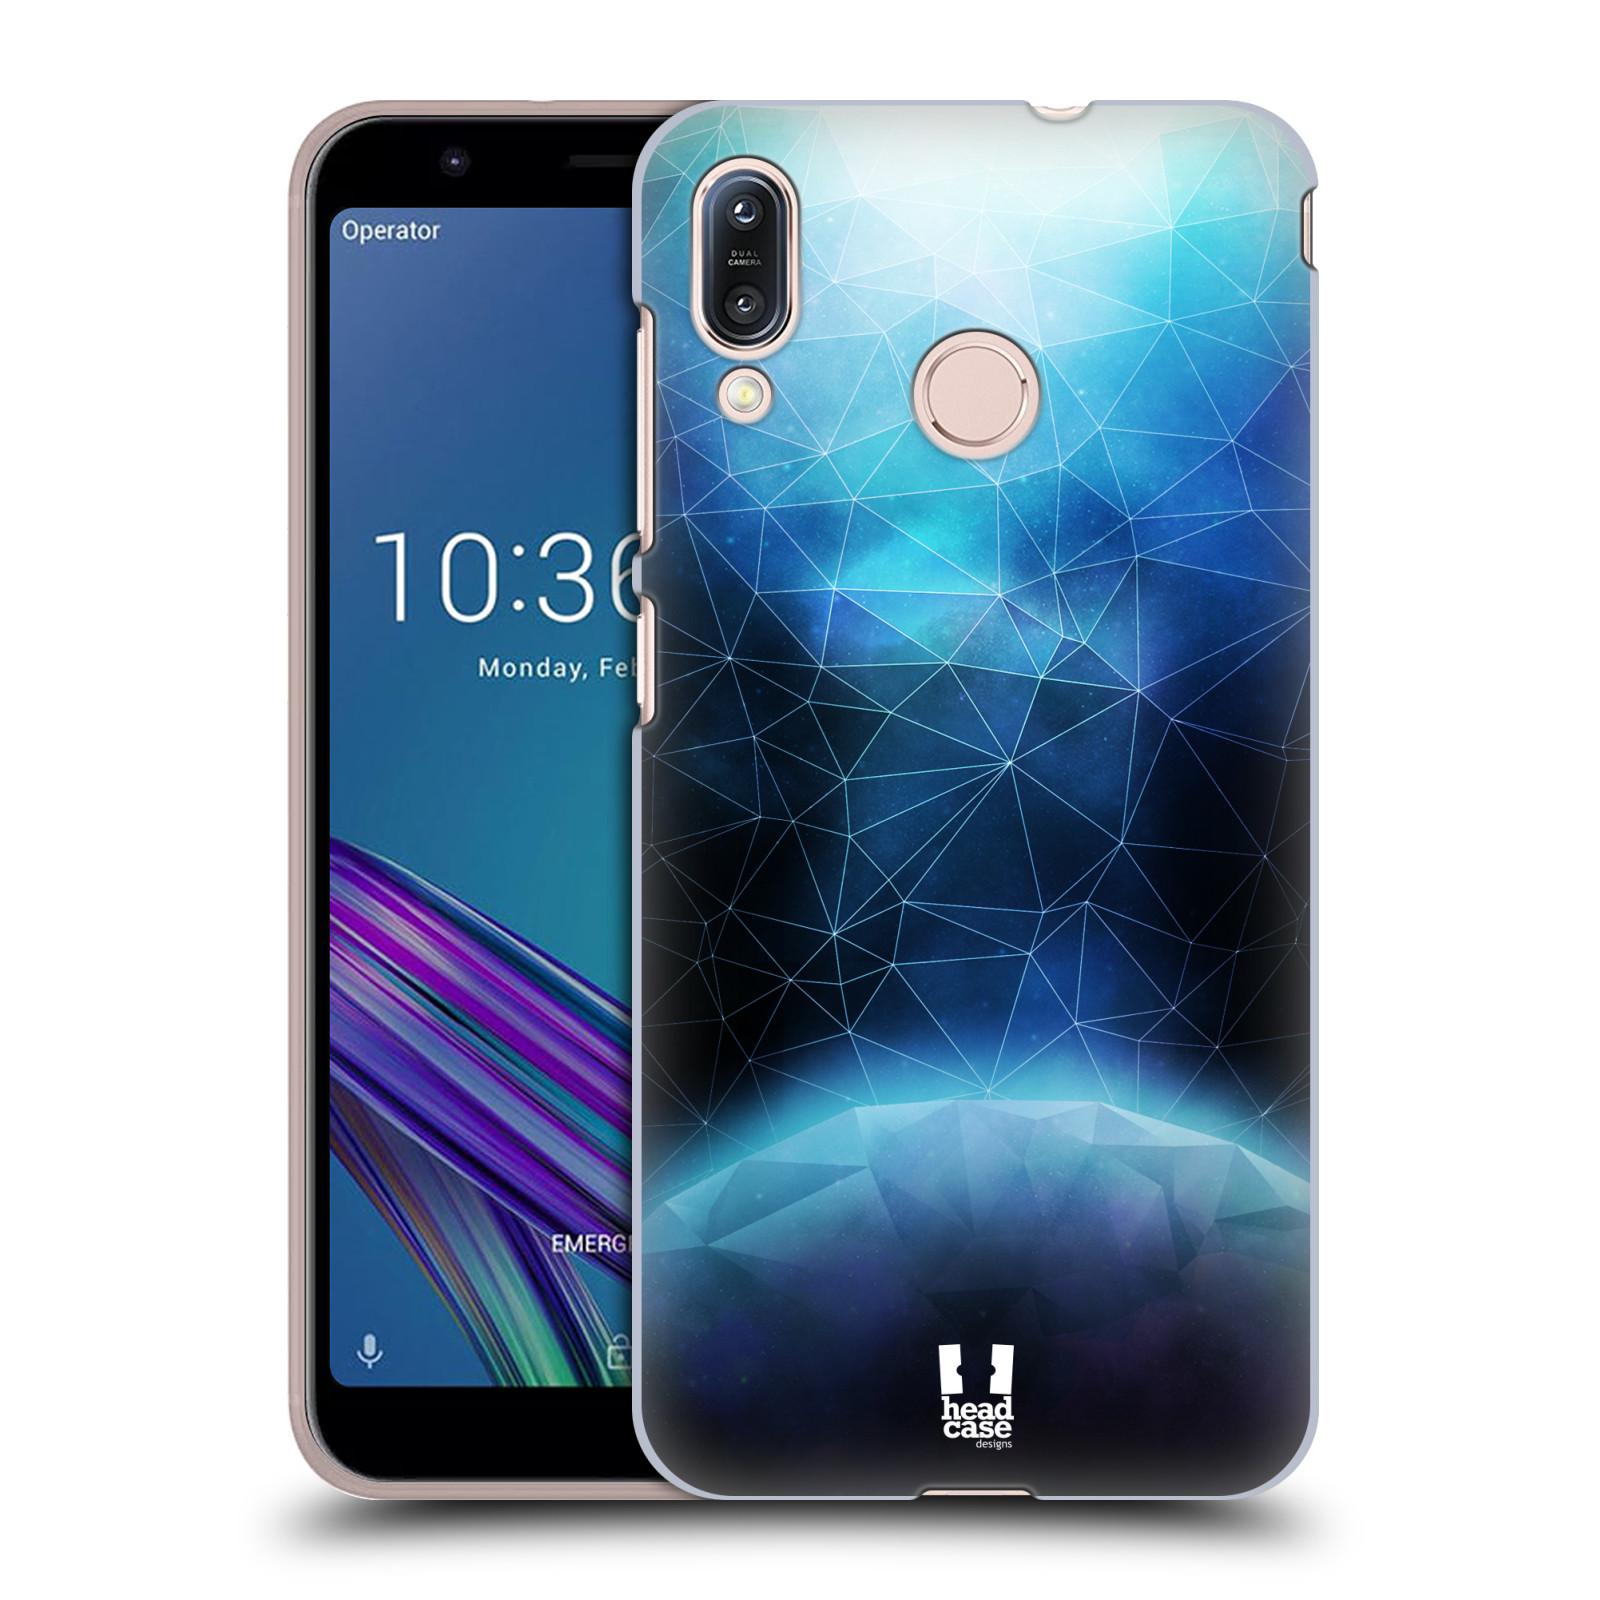 Plastové pouzdro na mobil Asus Zenfone Max M1 ZB555KL - Head Case - UNIVERSE ABSORB